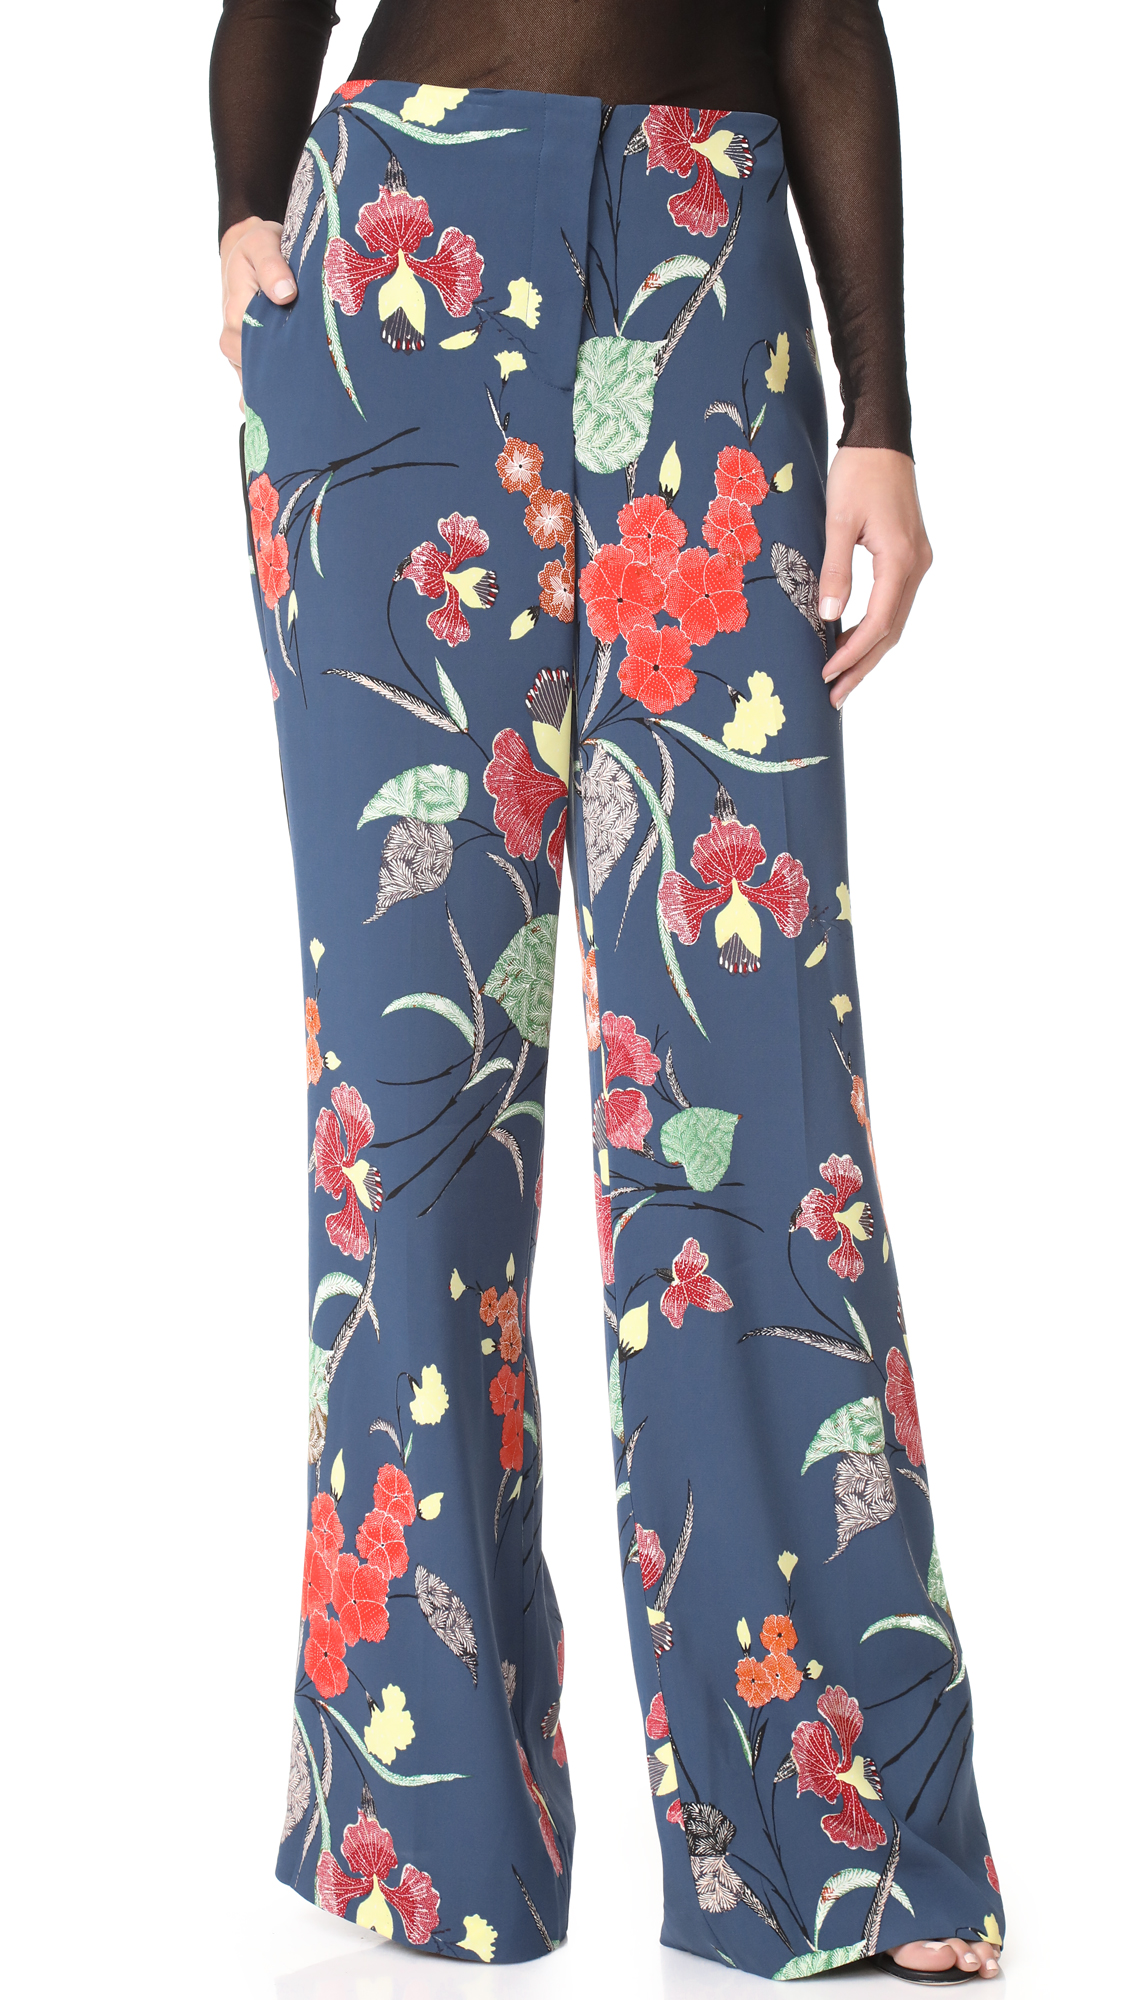 Karlie Kloss Wears Kimono Style Pants In Tokyo Daily Mail Online Rodeo Ellie Black Diane Von Furstenberg Wide Leg At Shopbopcom